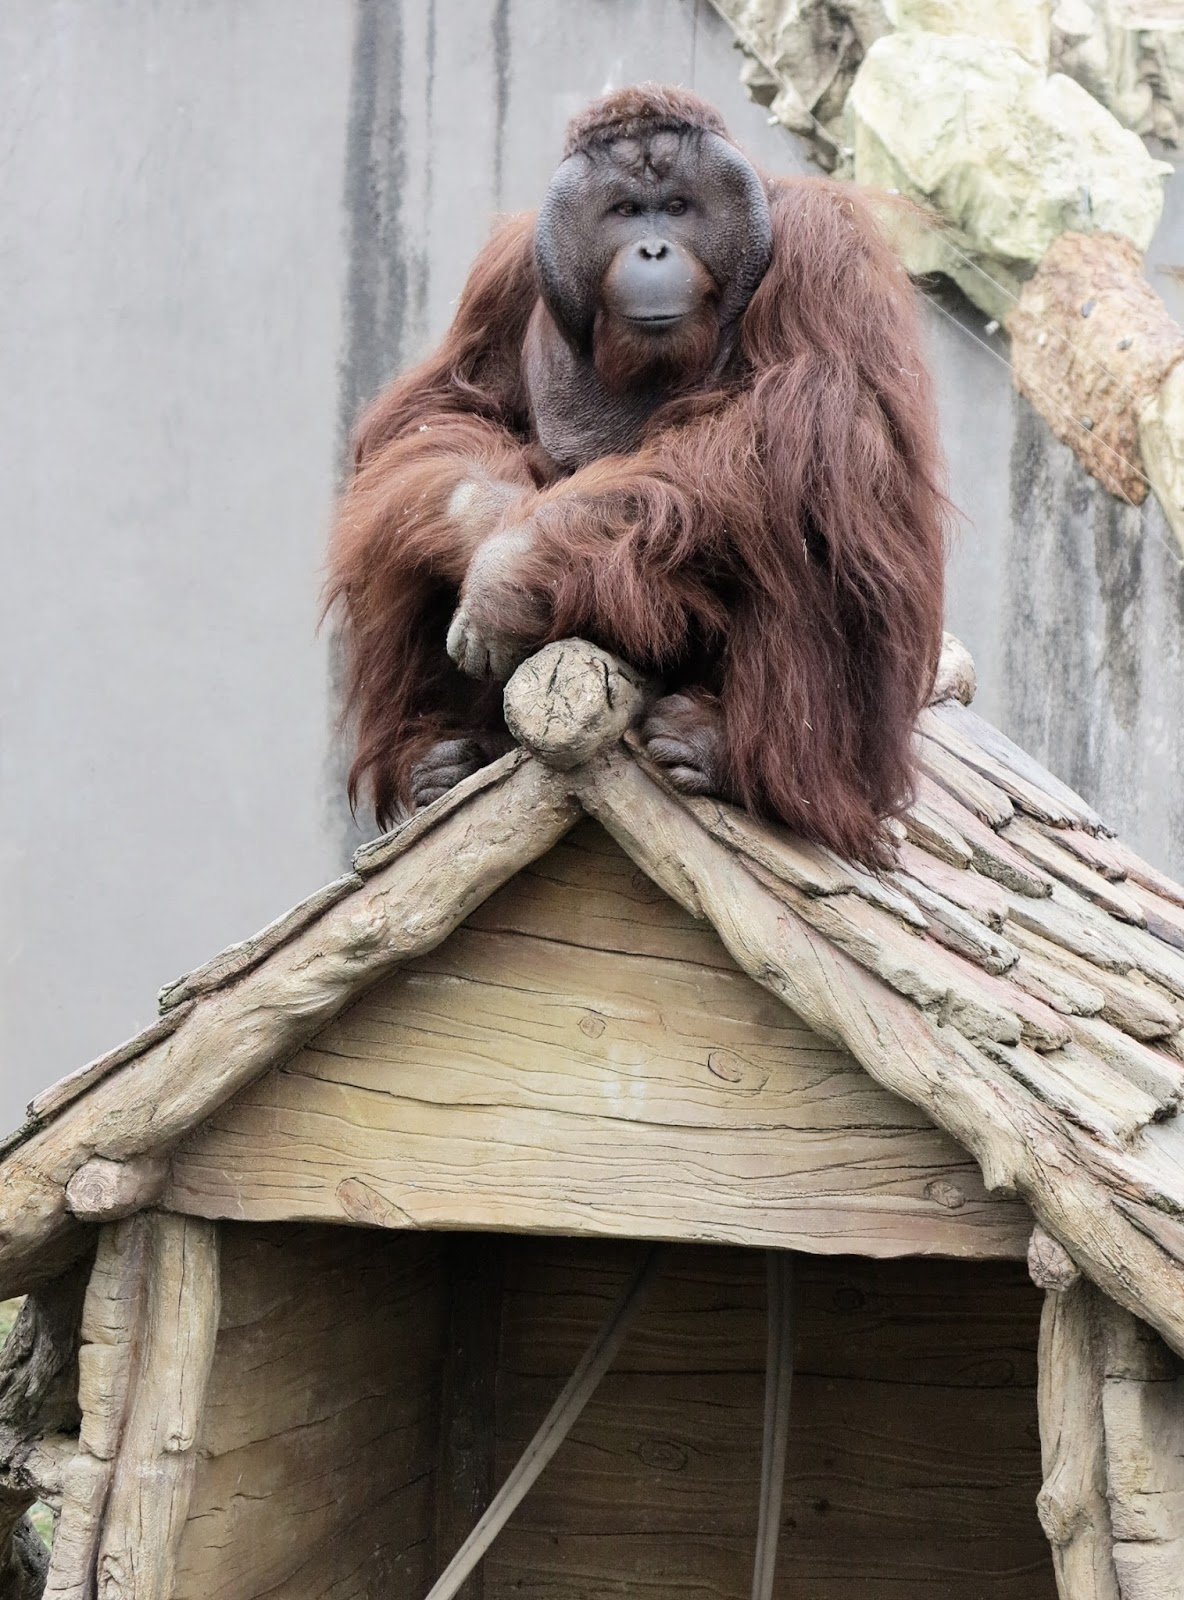 Picture of a pet orangutan.